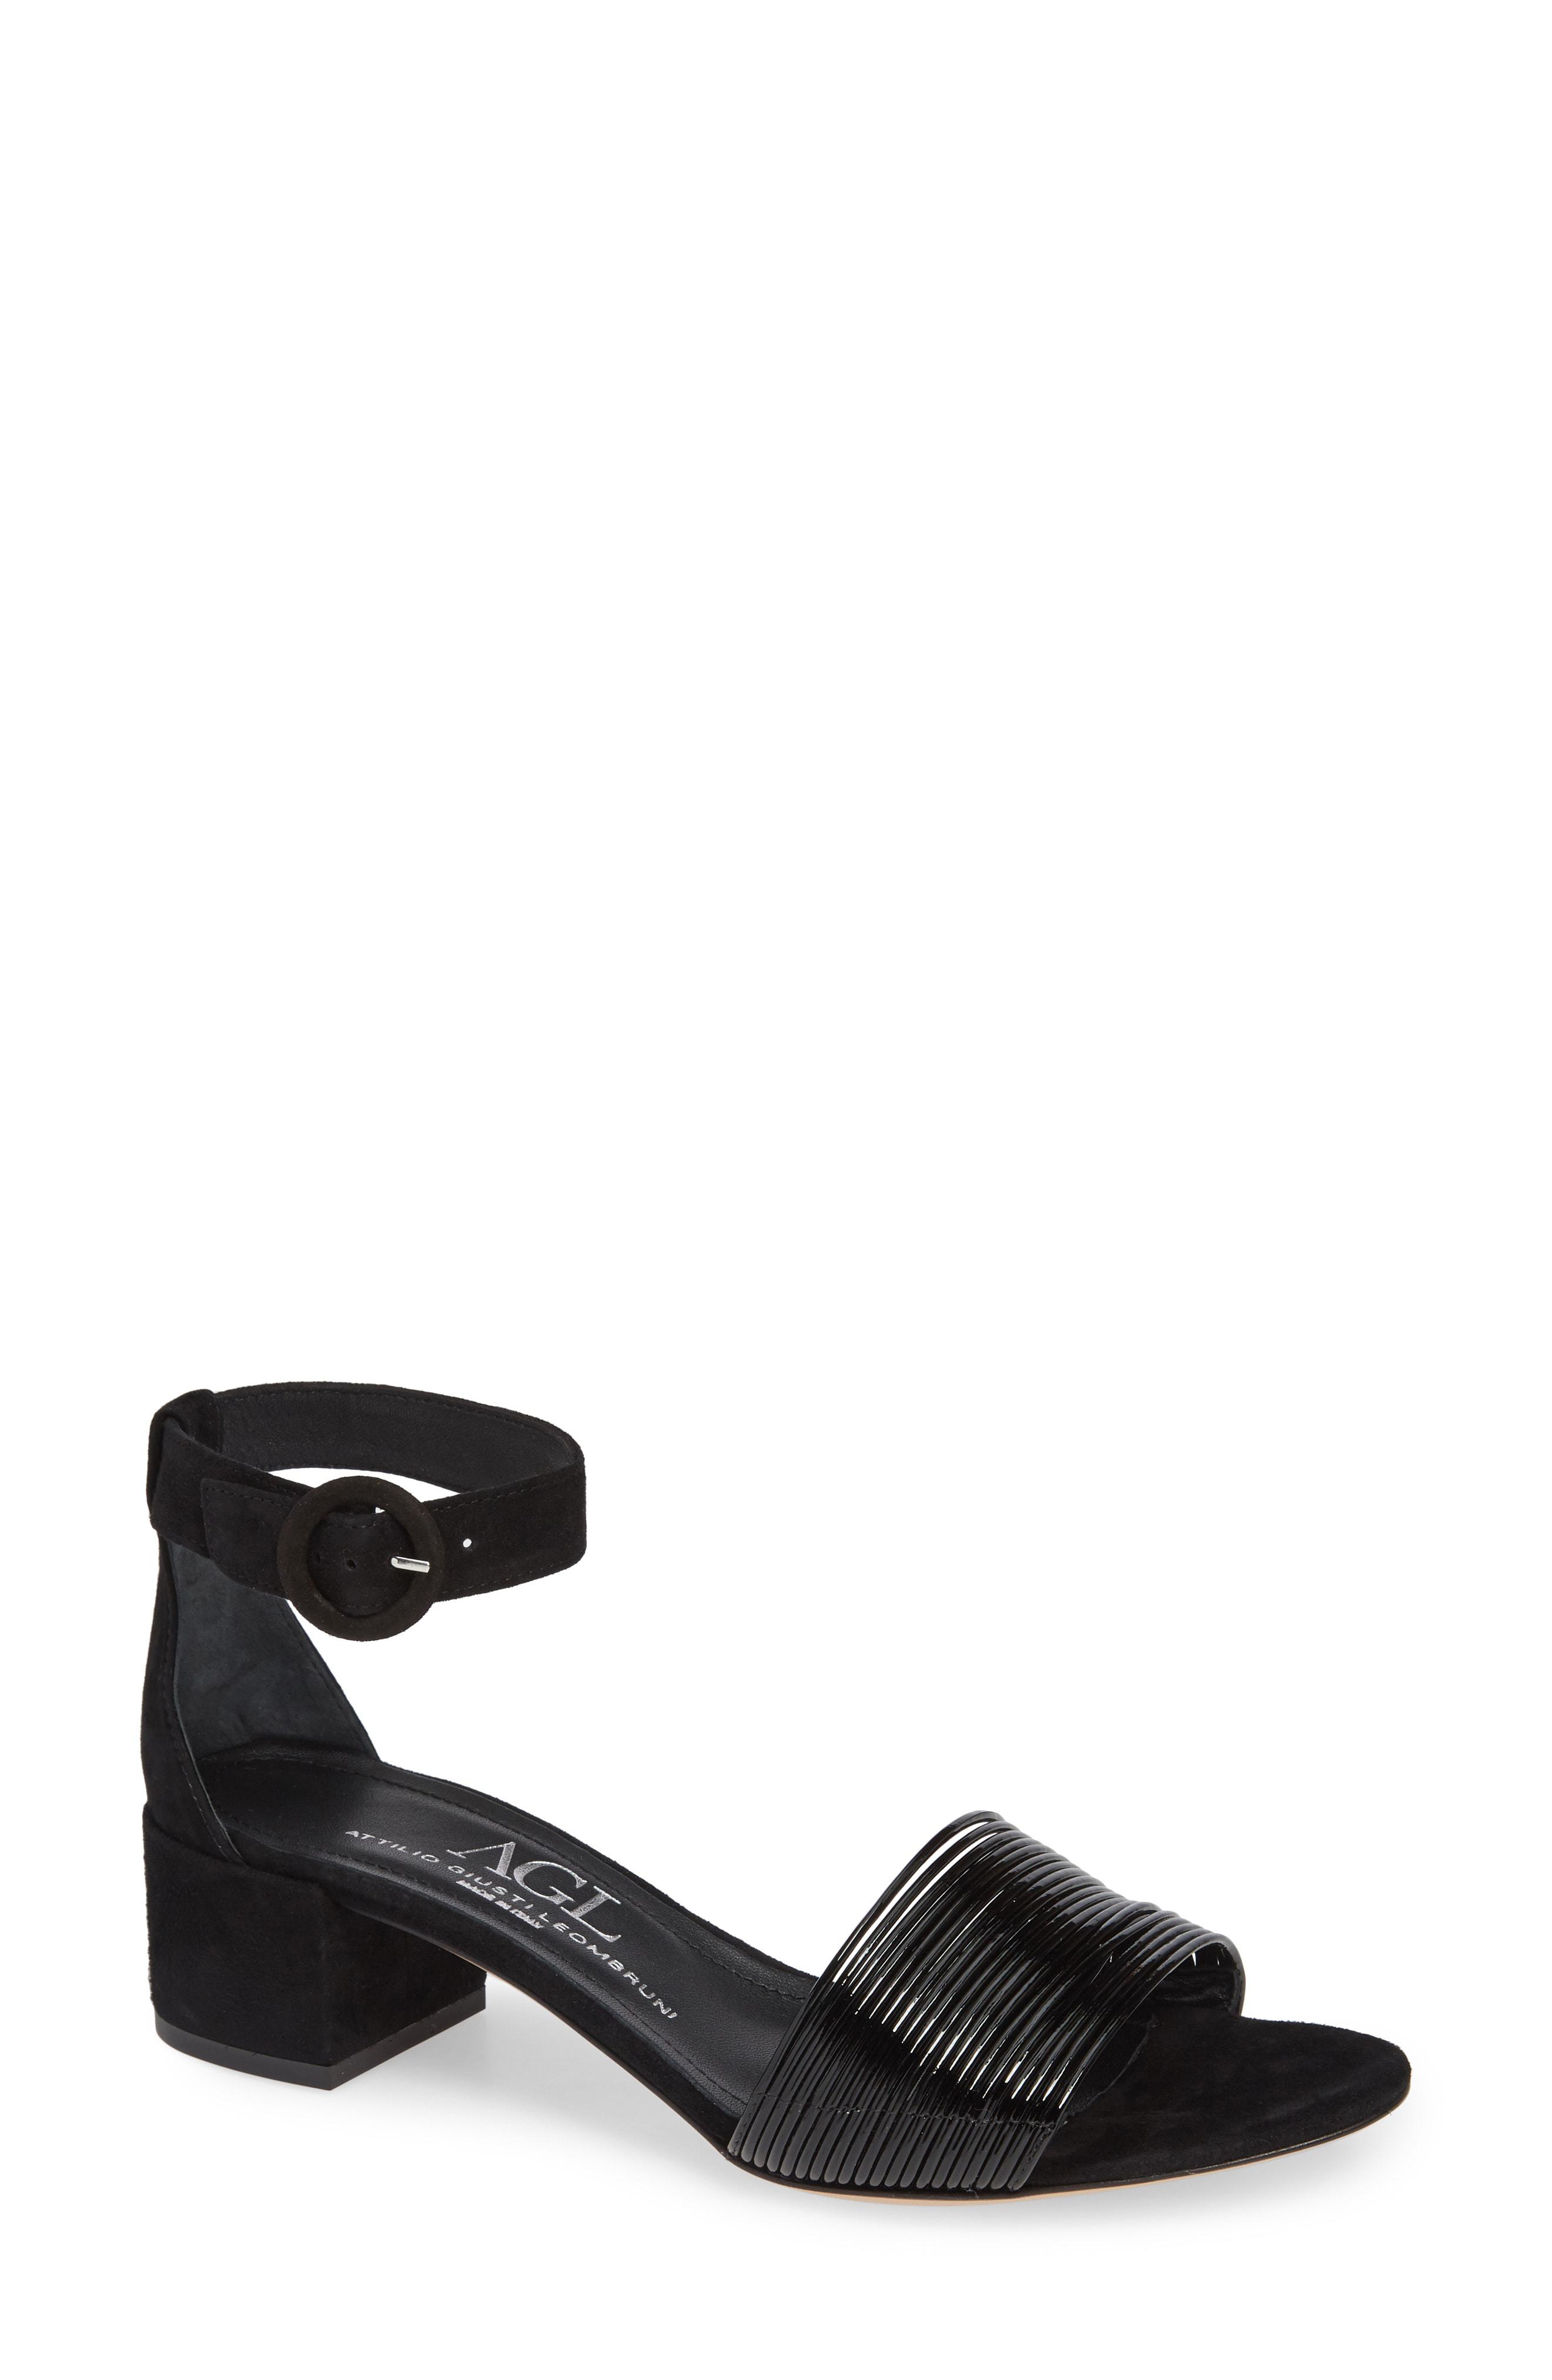 2ef7c9a7a0a Agl Attilio Giusti Leombruni Ankle Strap Sandal In Platinum Leather ...